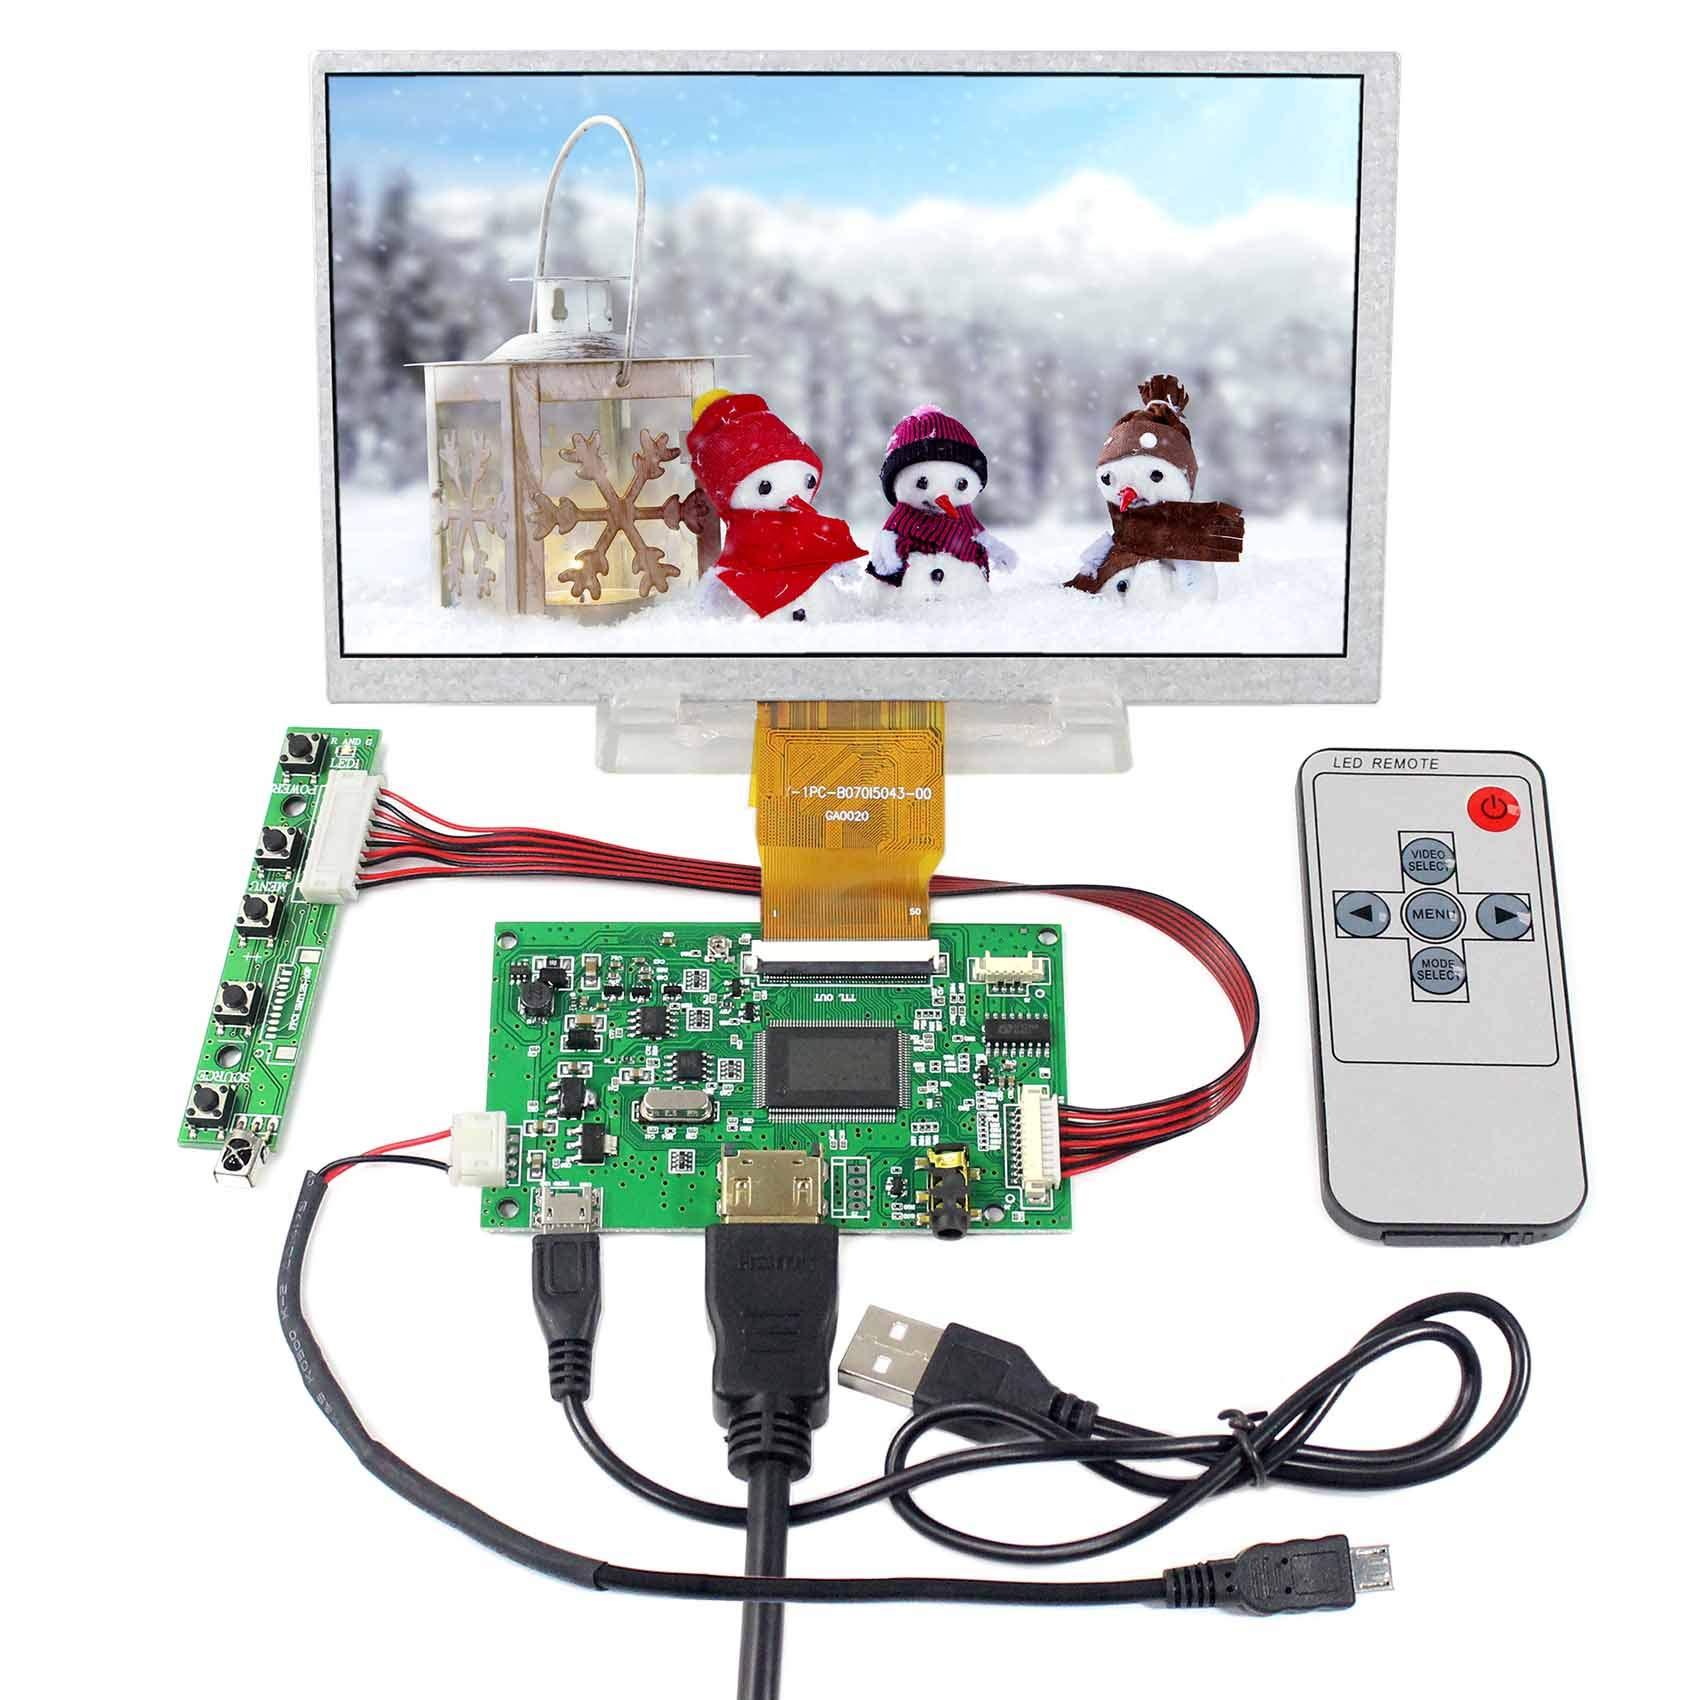 Controladora Lcd Hdmi Vga 7 1024x600 Raspberry Pi